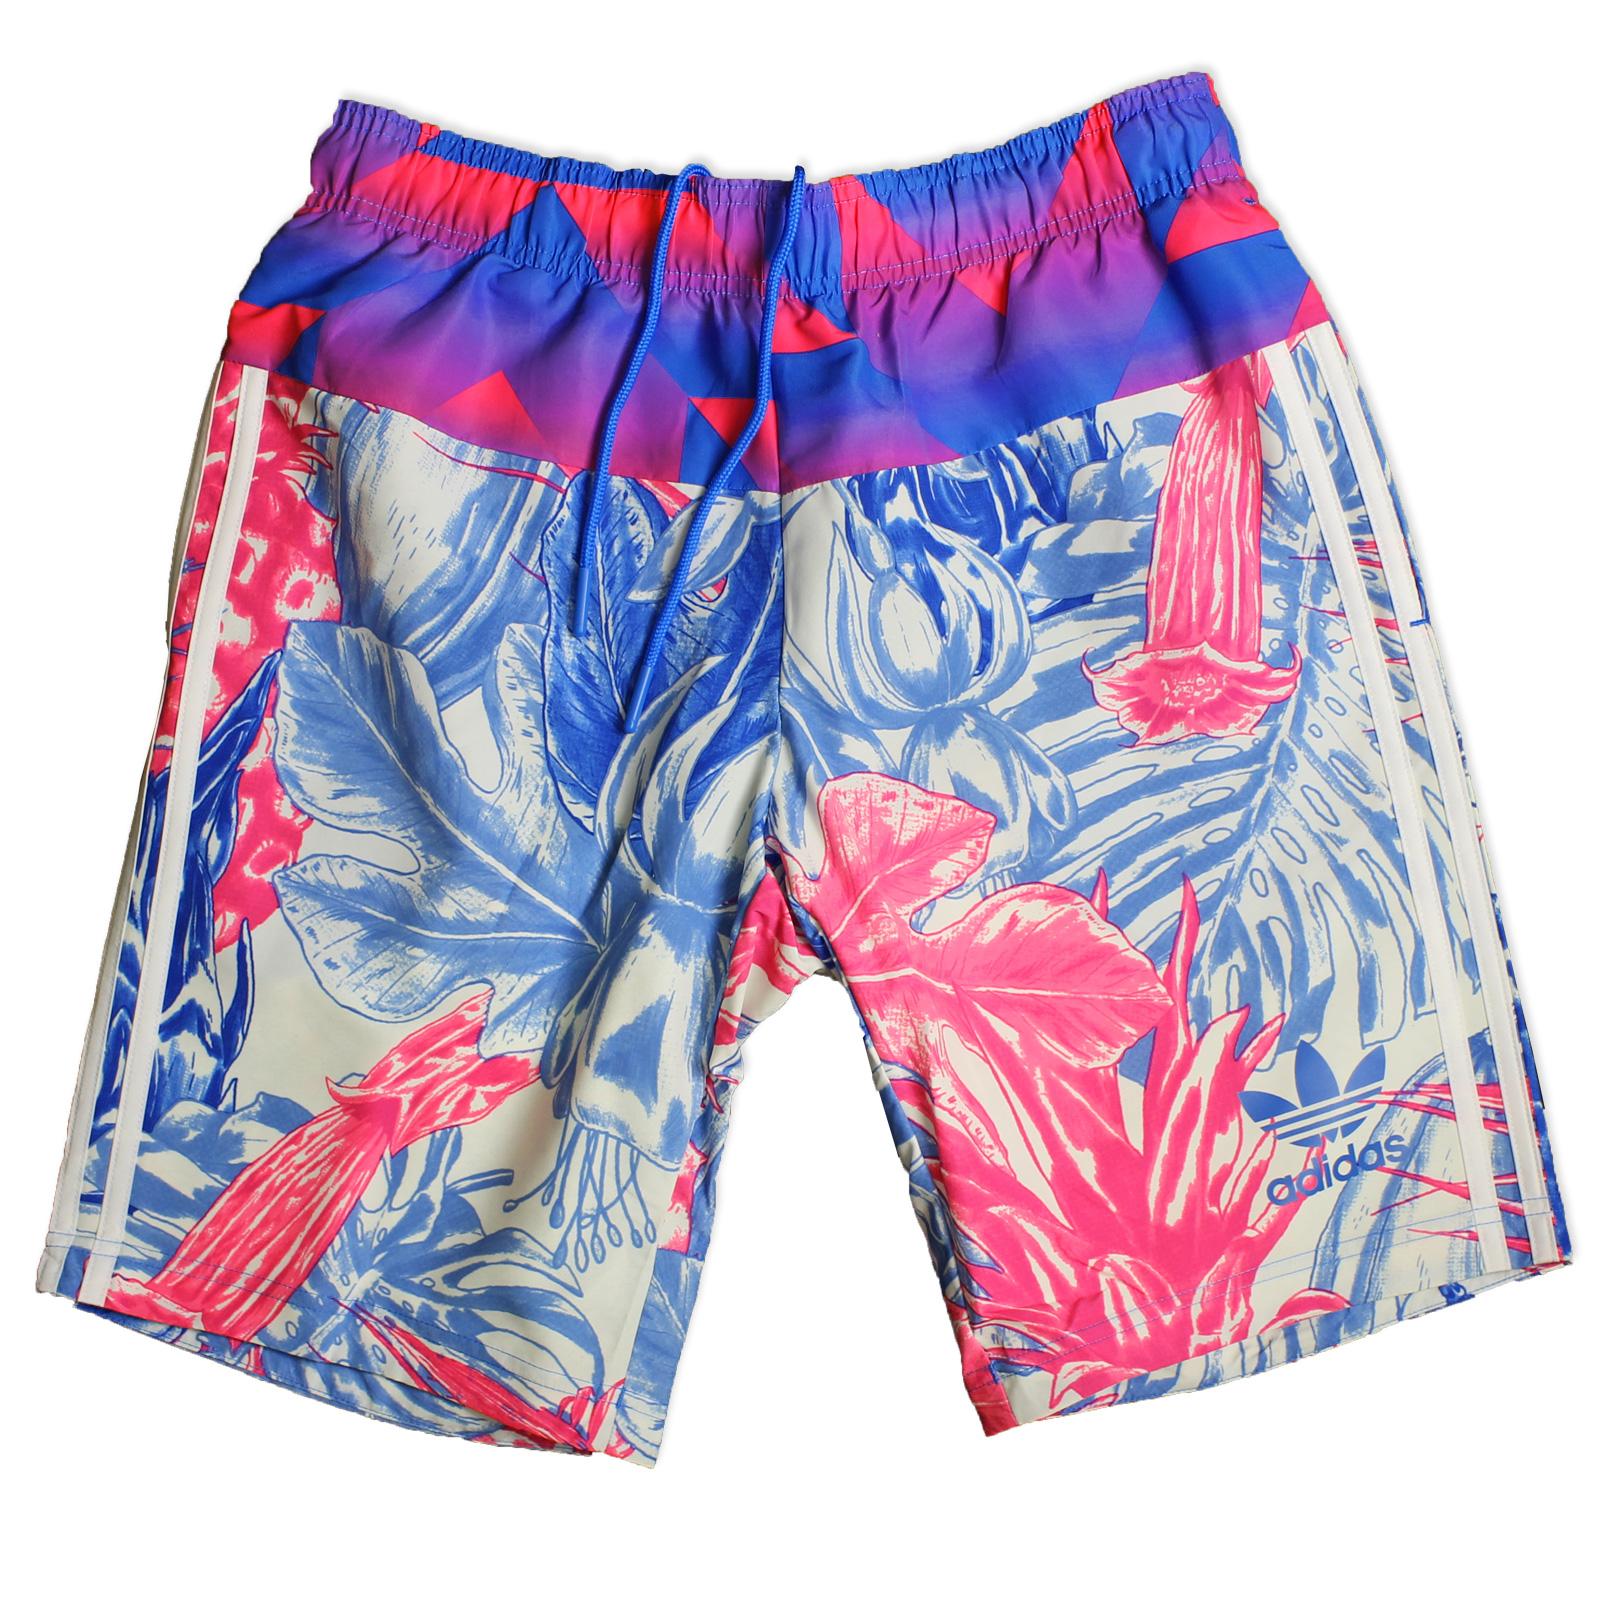 6b0e49e0d90927 adidas Originals Herren Badeshorts Badehose Flowerrush Shorts Weiß Blau Pink